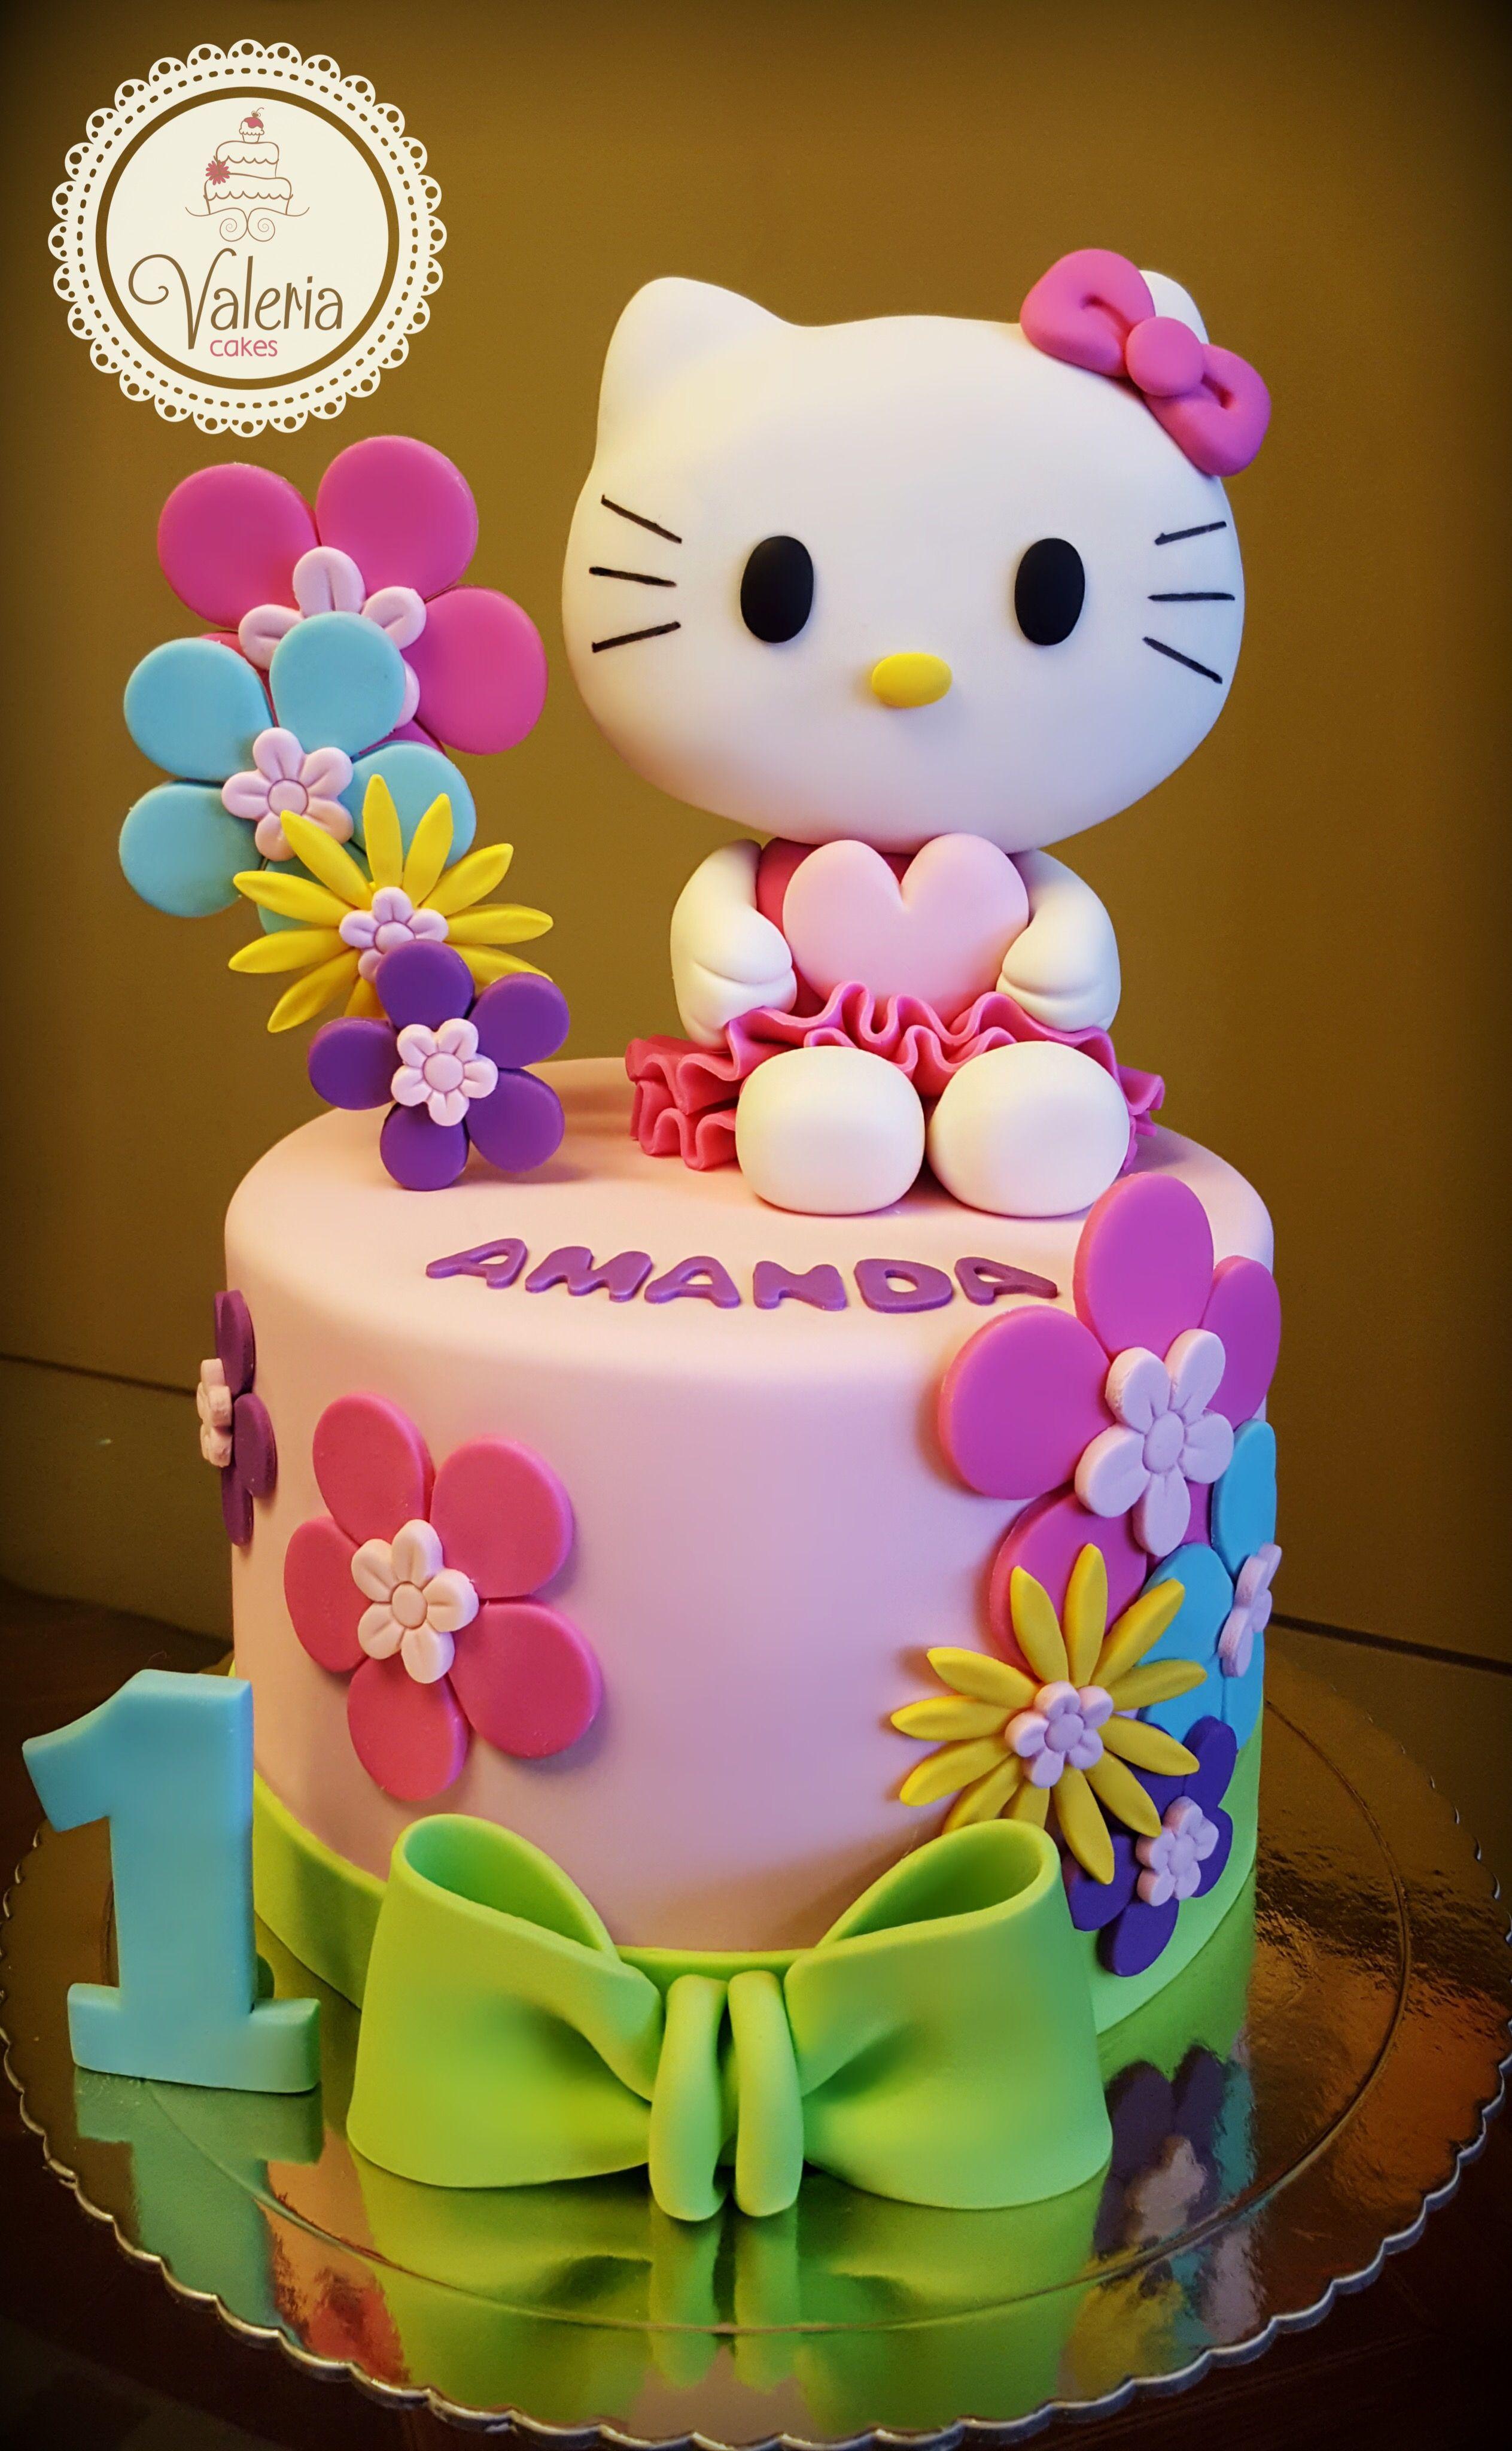 Flower Hello Kitty Fondant Cake ️🌹 Torta Hello Kitty Con